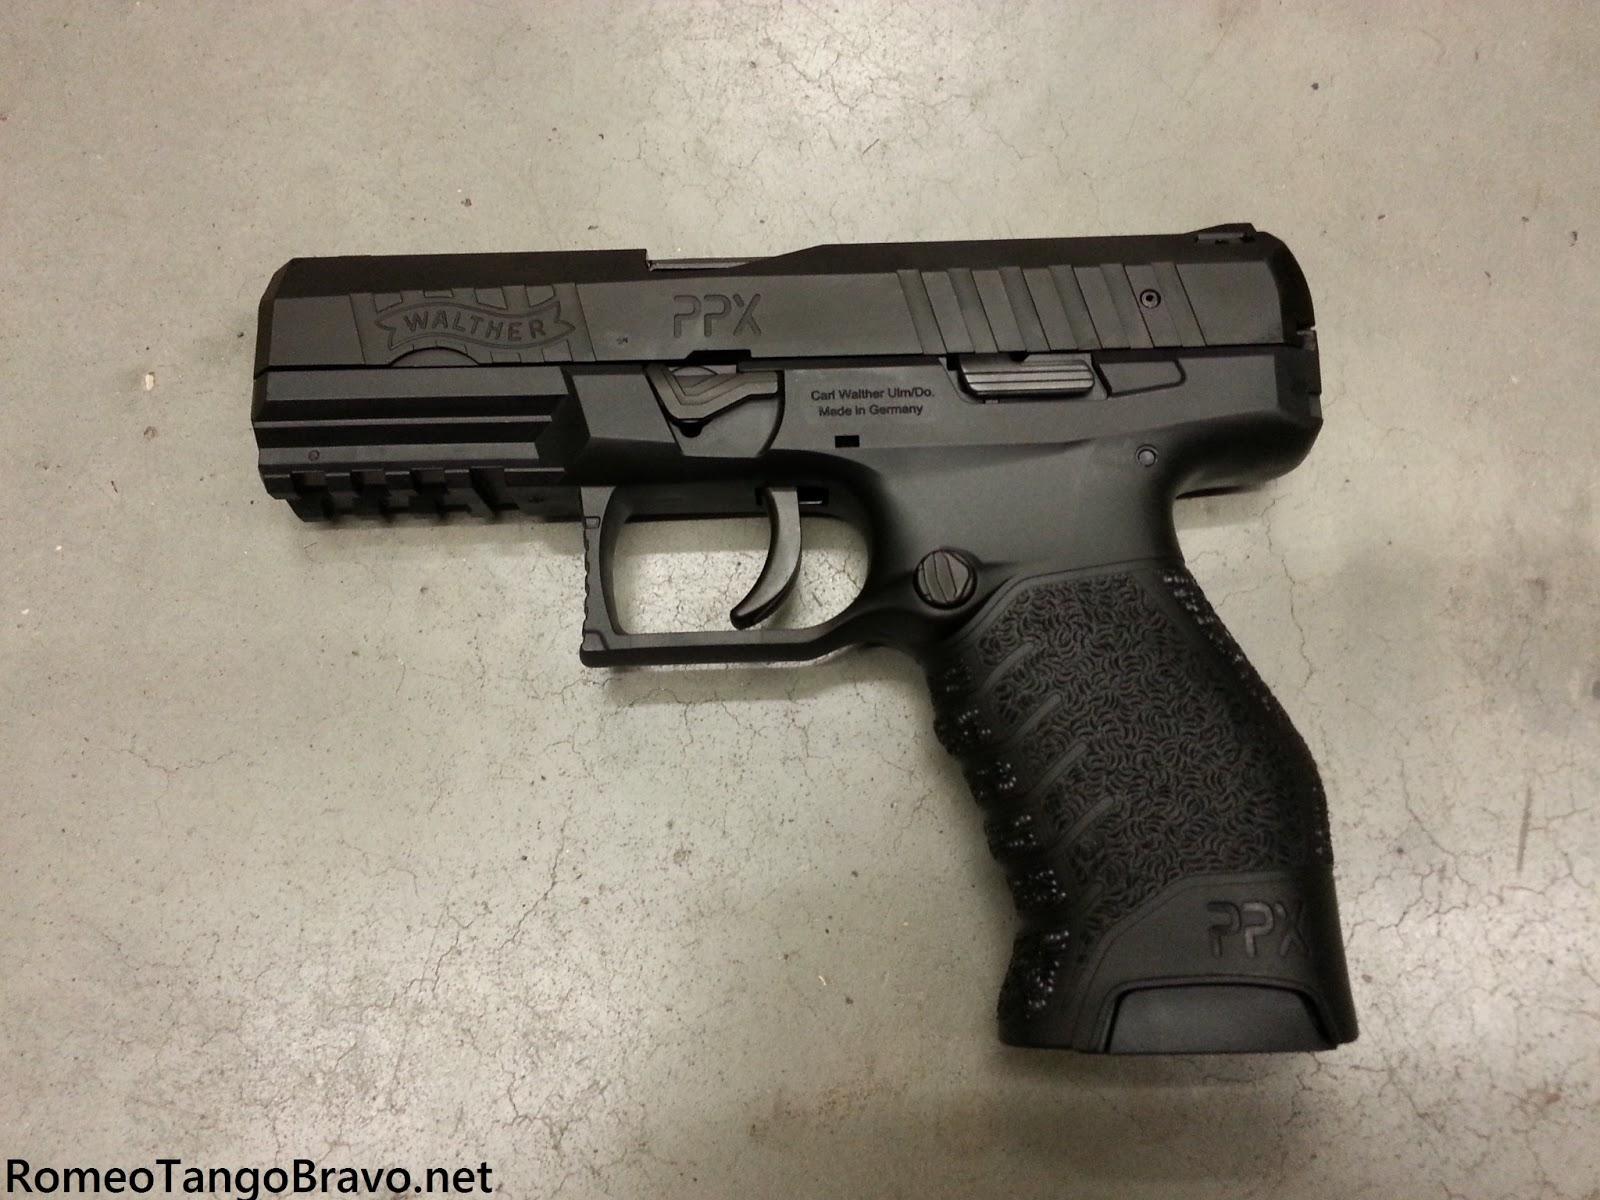 Romeotangobravo Walther Ppx Hits The Shelves